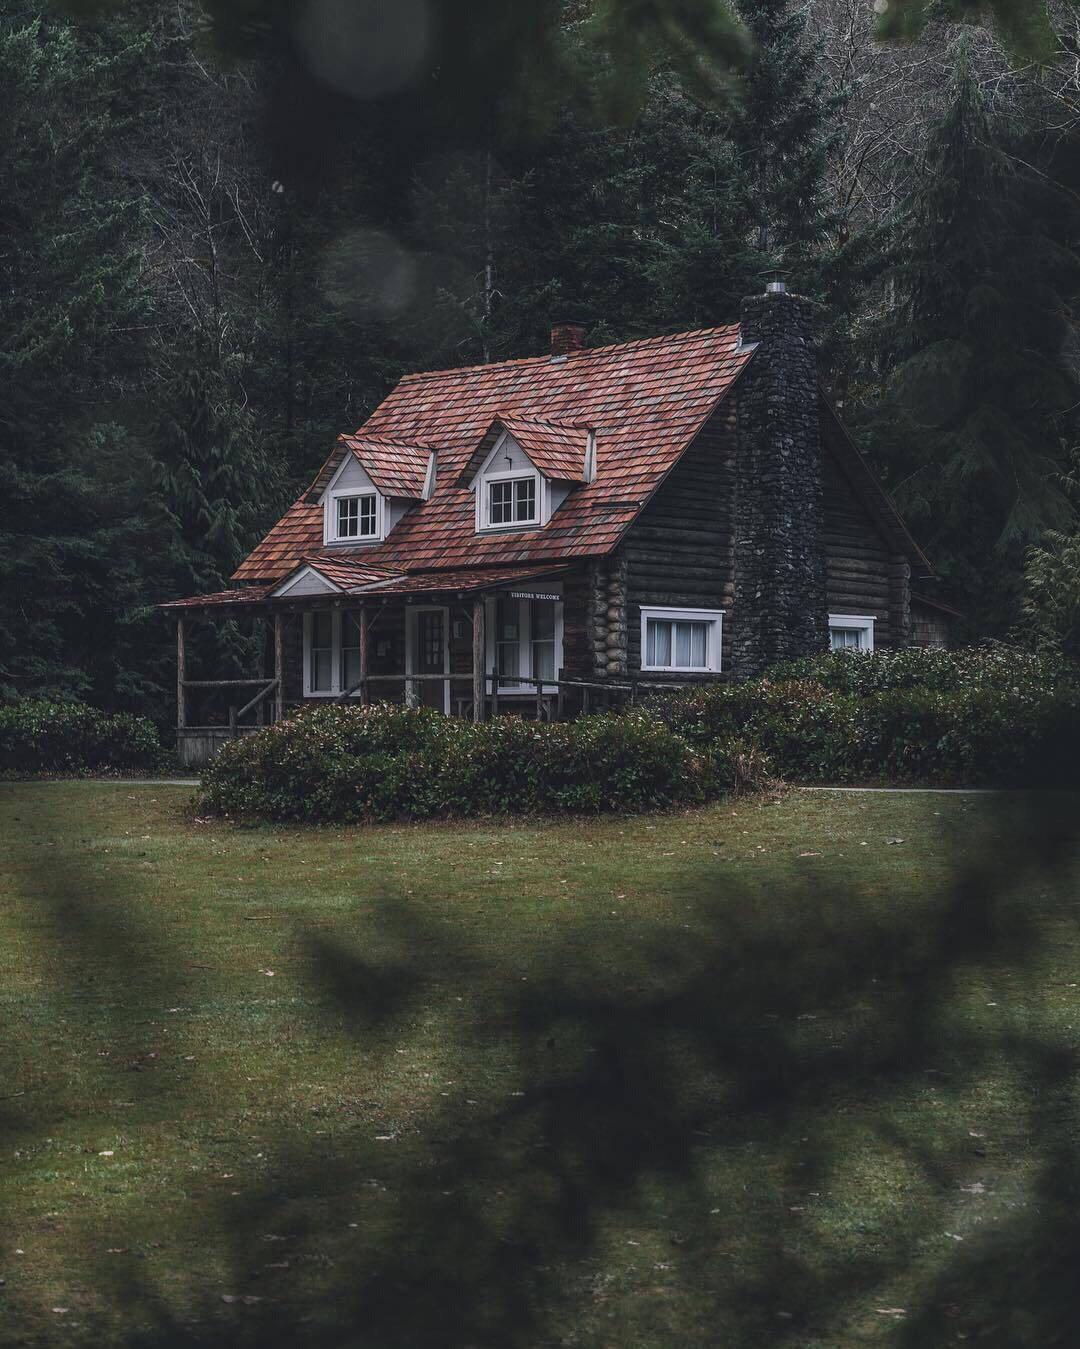 Роскошные пейзажи Норвегии - Страница 6 1CeHy7OxWdQ